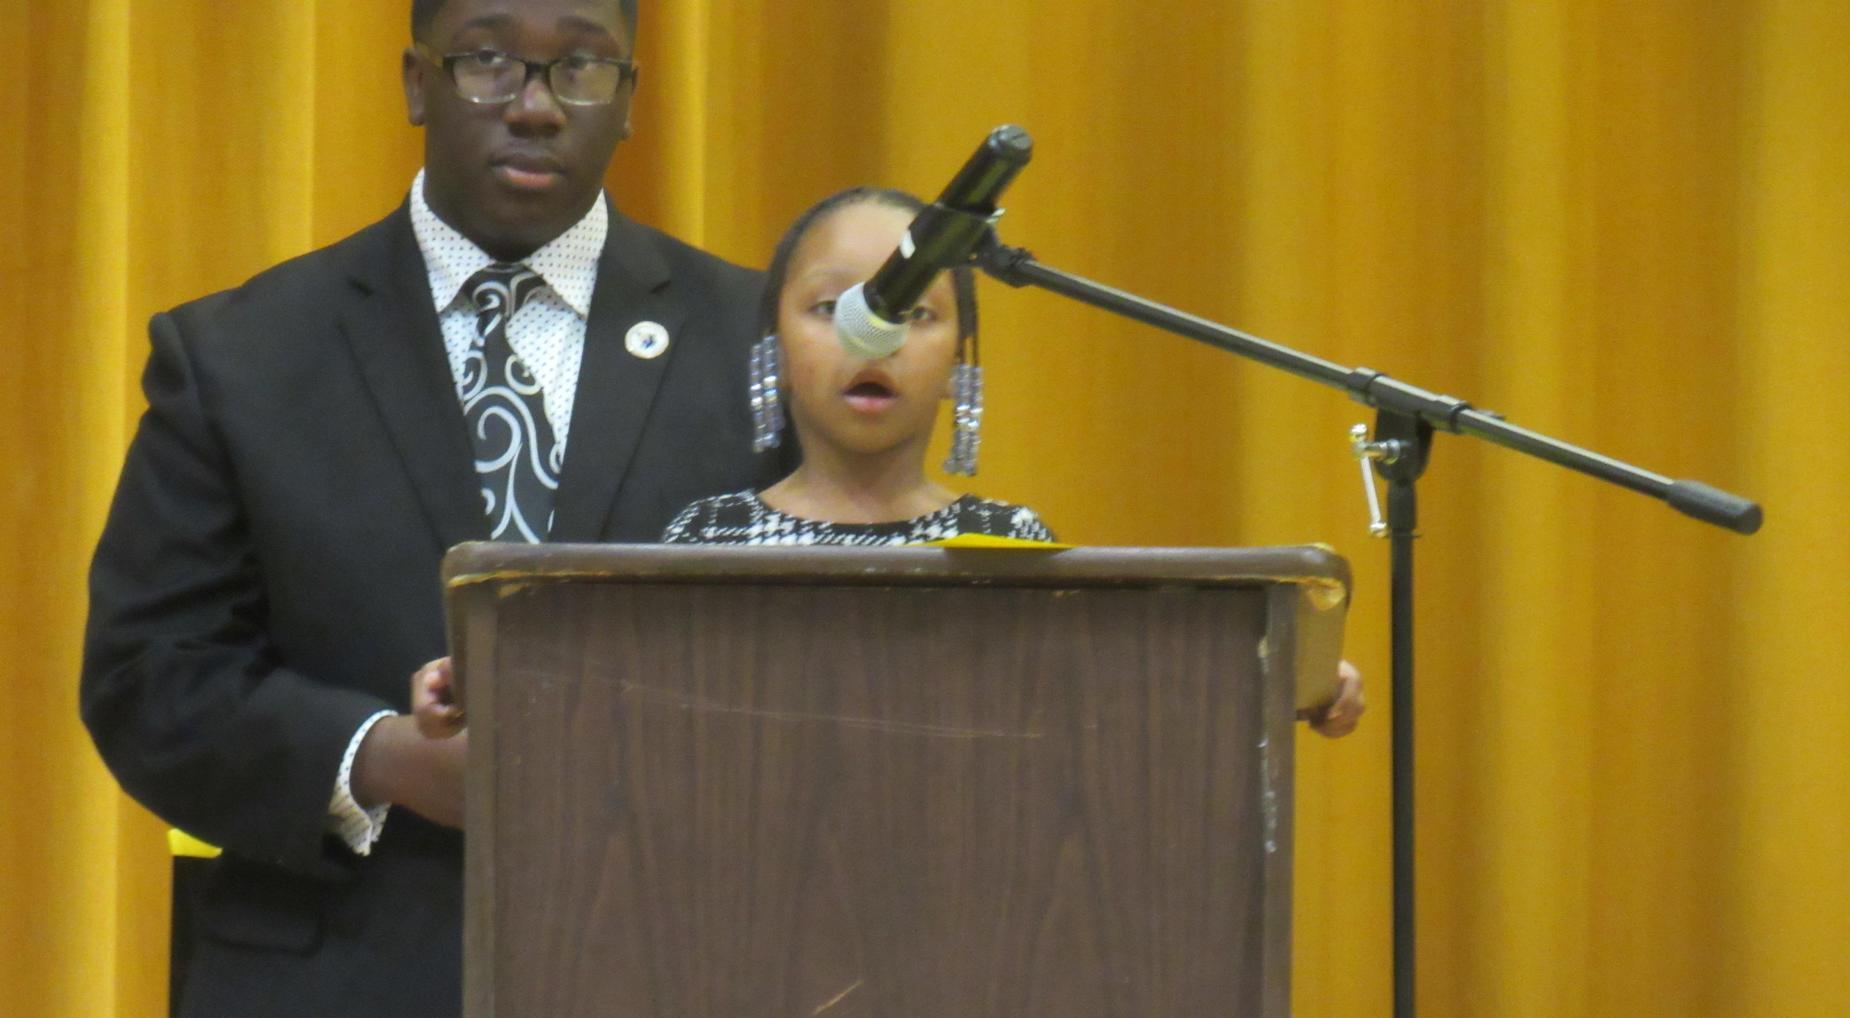 LLE MLK Oratorical Speech Contest Winner